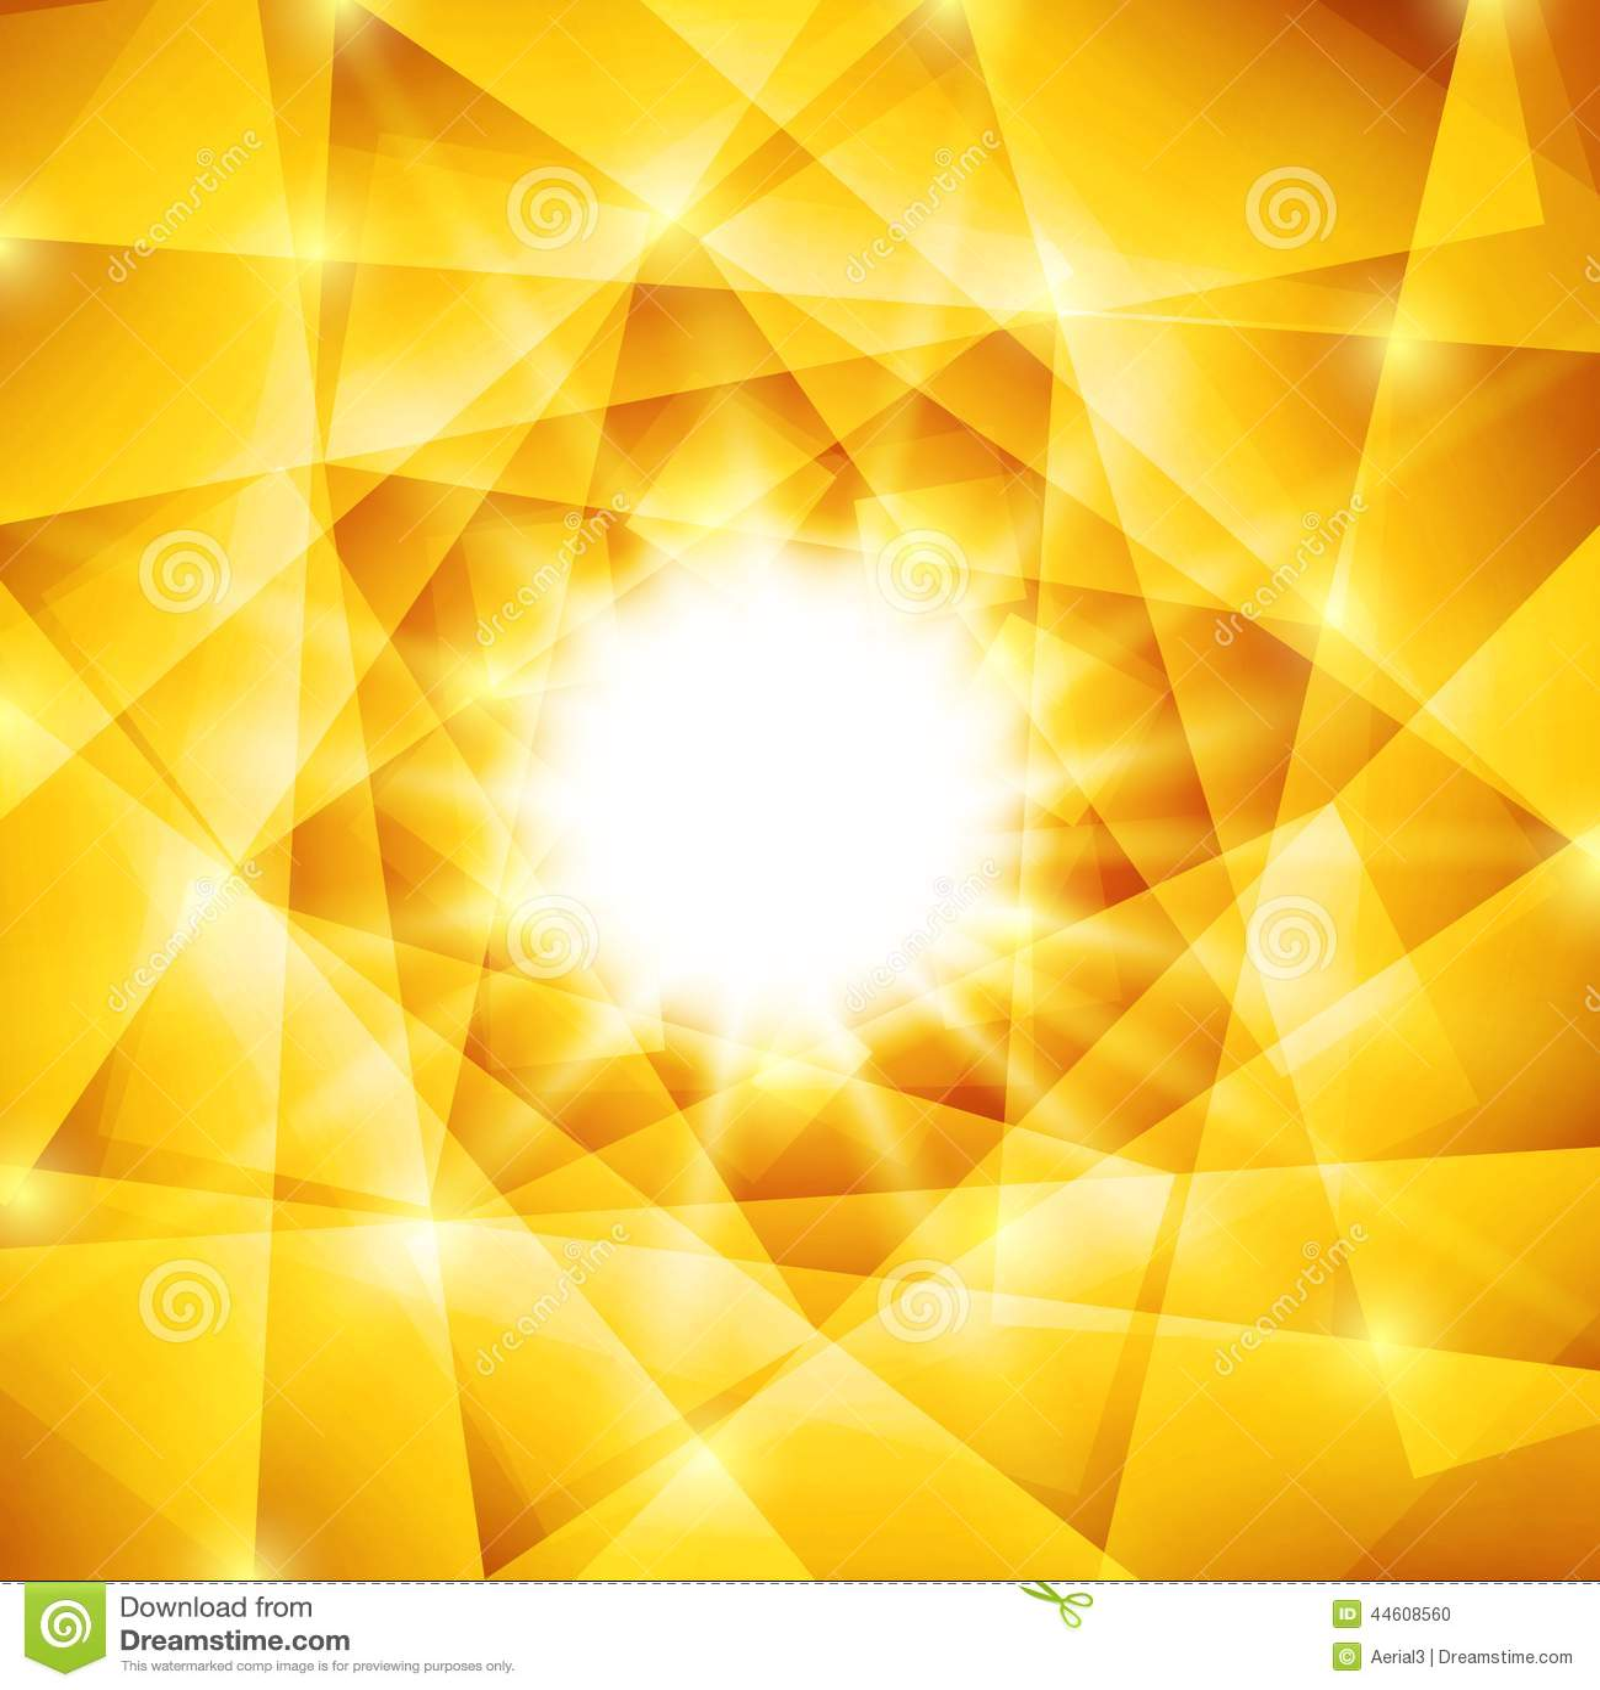 geometric yellow background illustration - photo #46